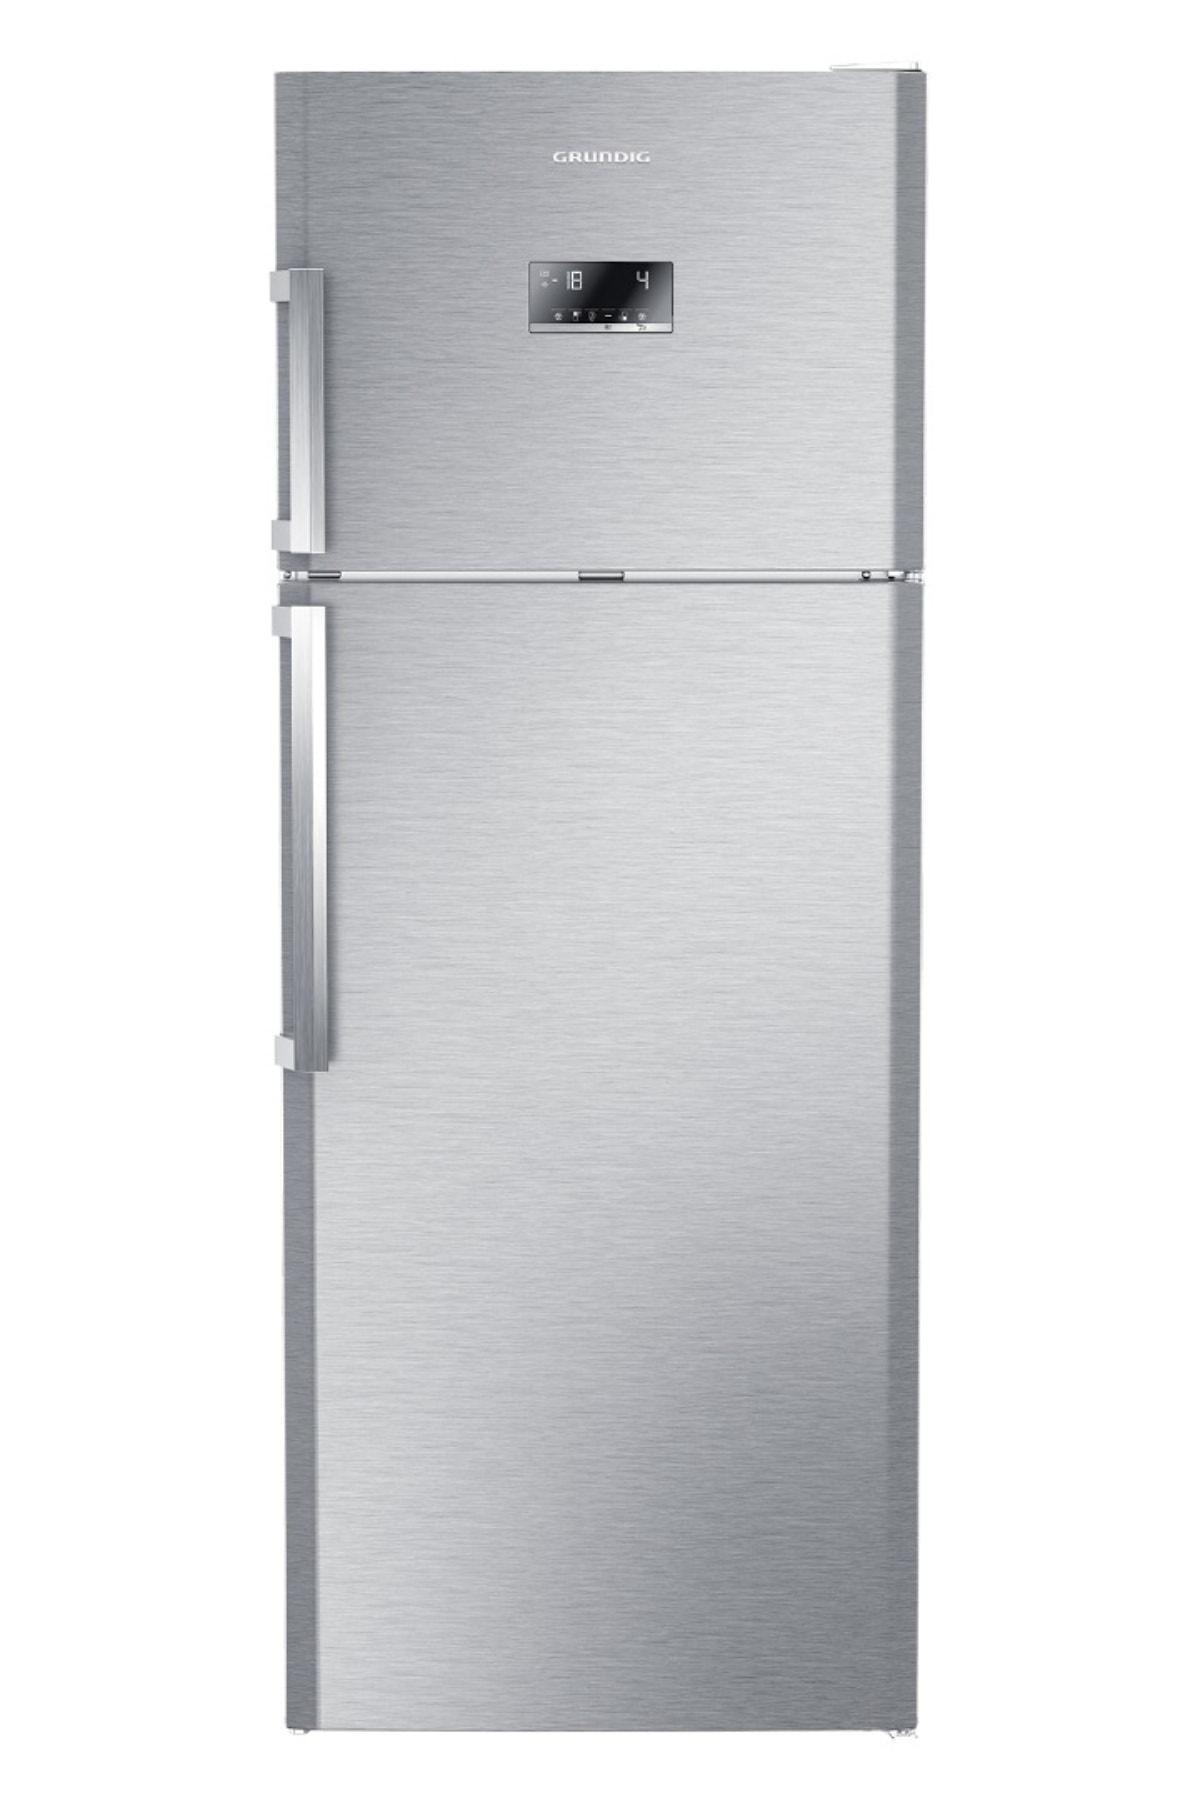 Grundig GRND 5100 I A++ 510 lt No-Frost Buzdolabı 1